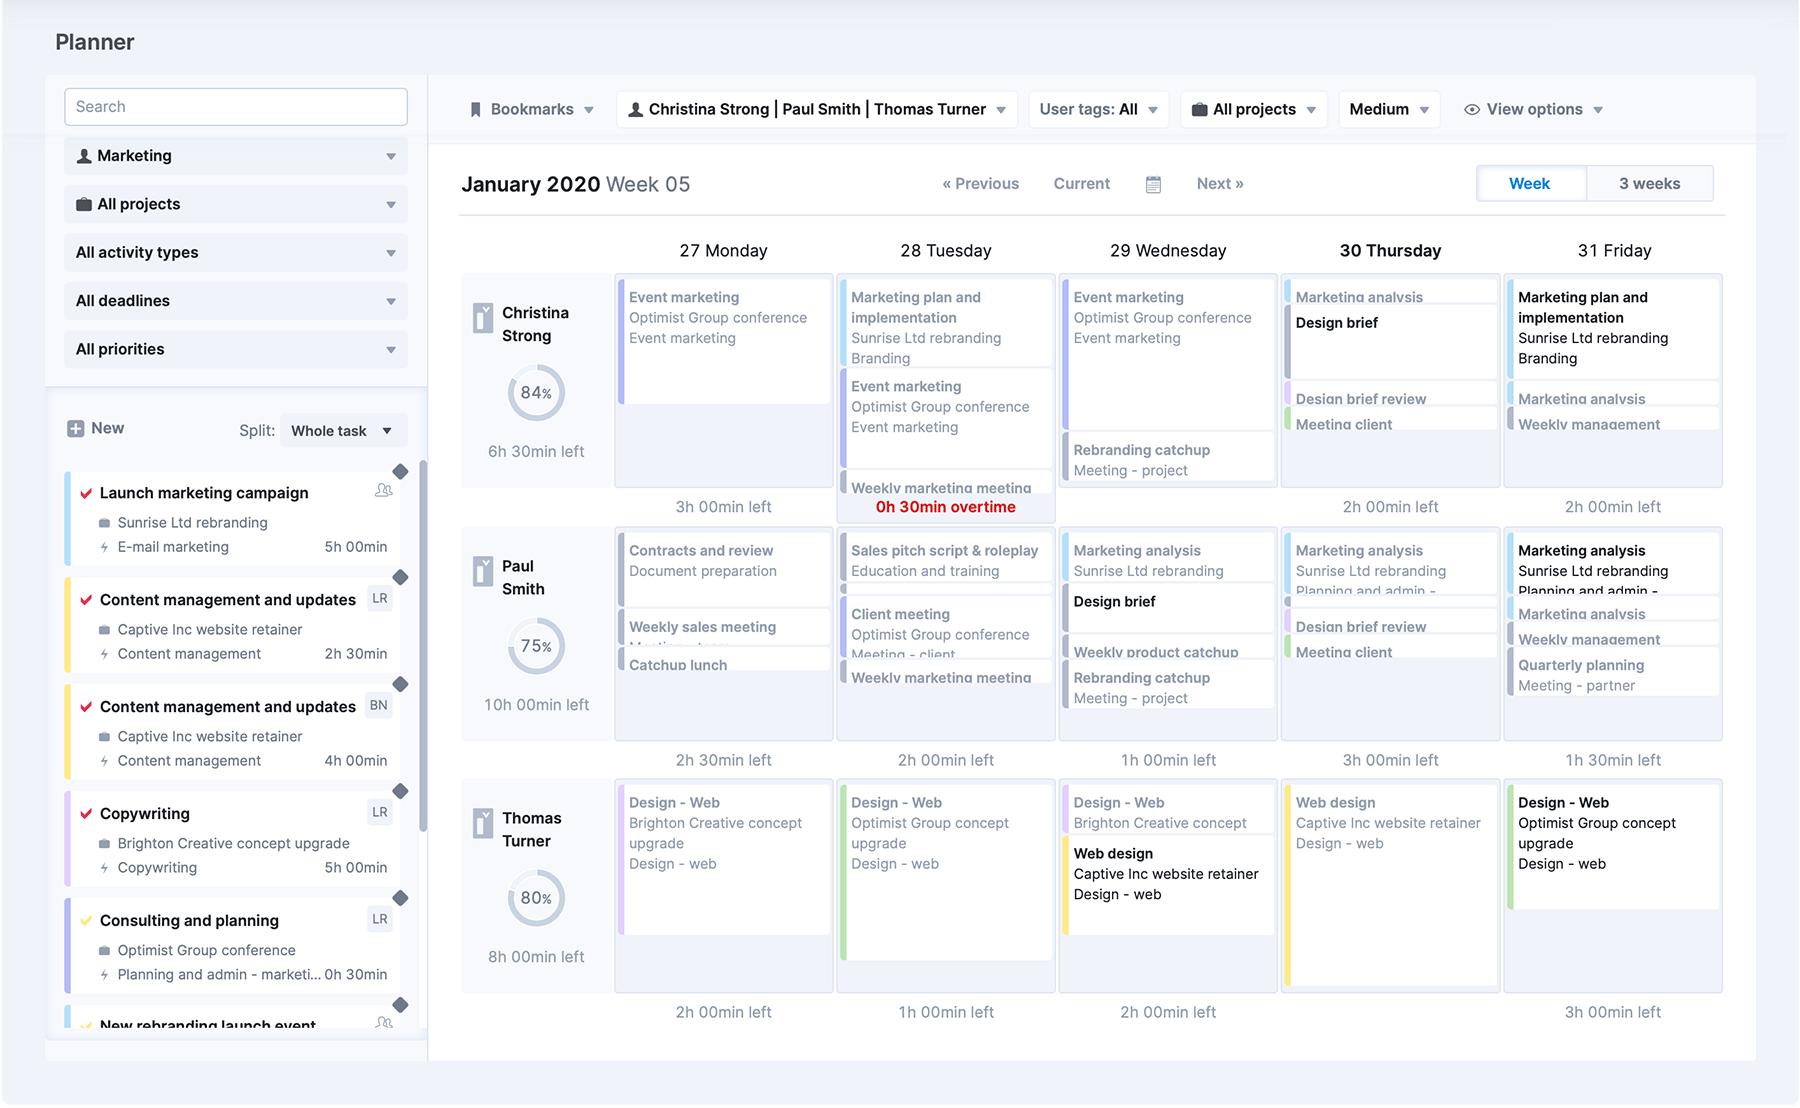 Scoro's Planner - Week view